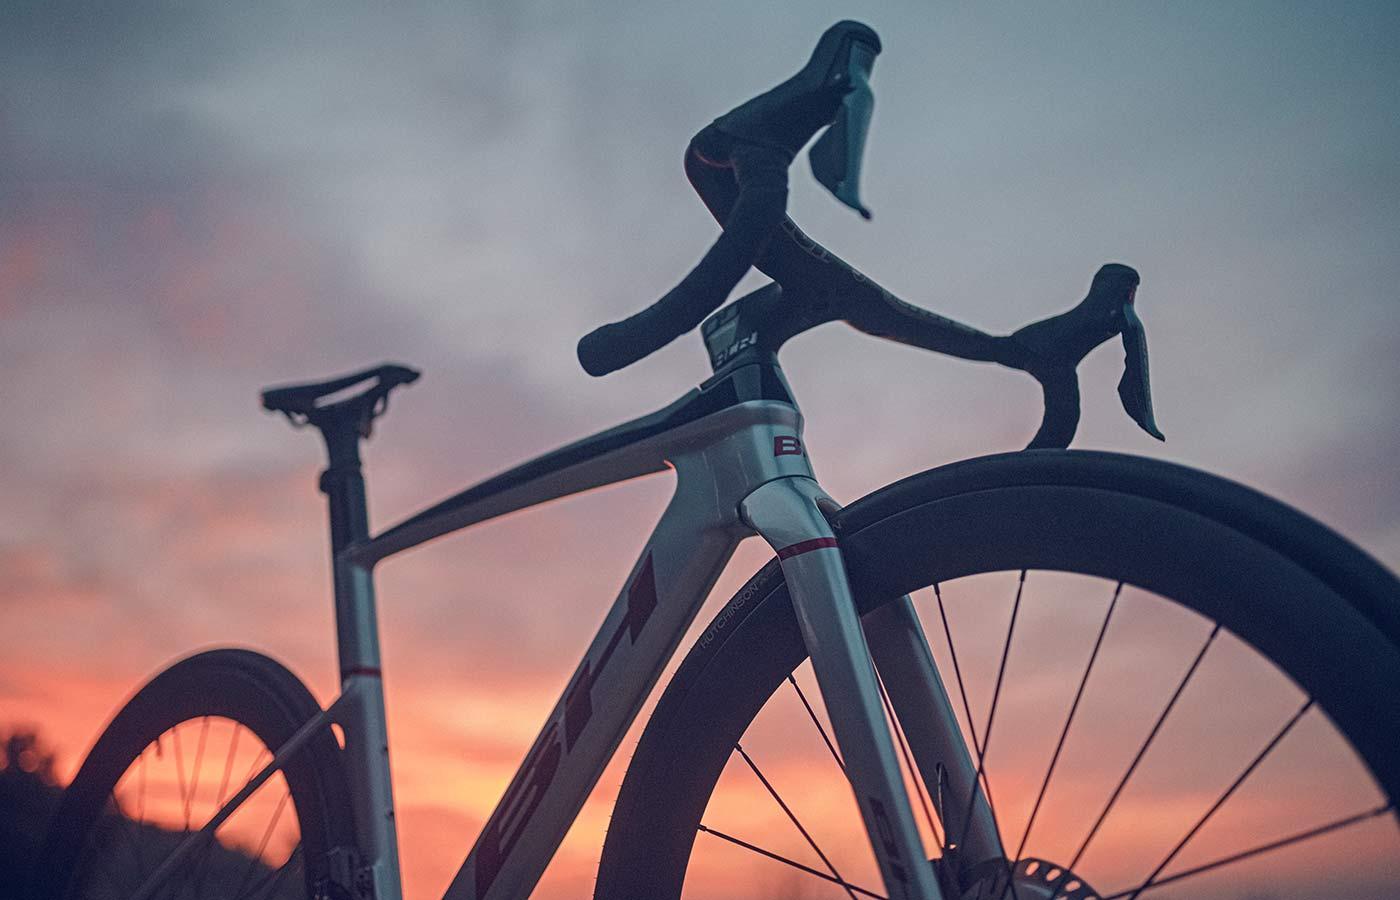 2022 BH Aerolight lightweight aero carbon all-rounder road bike,sunset